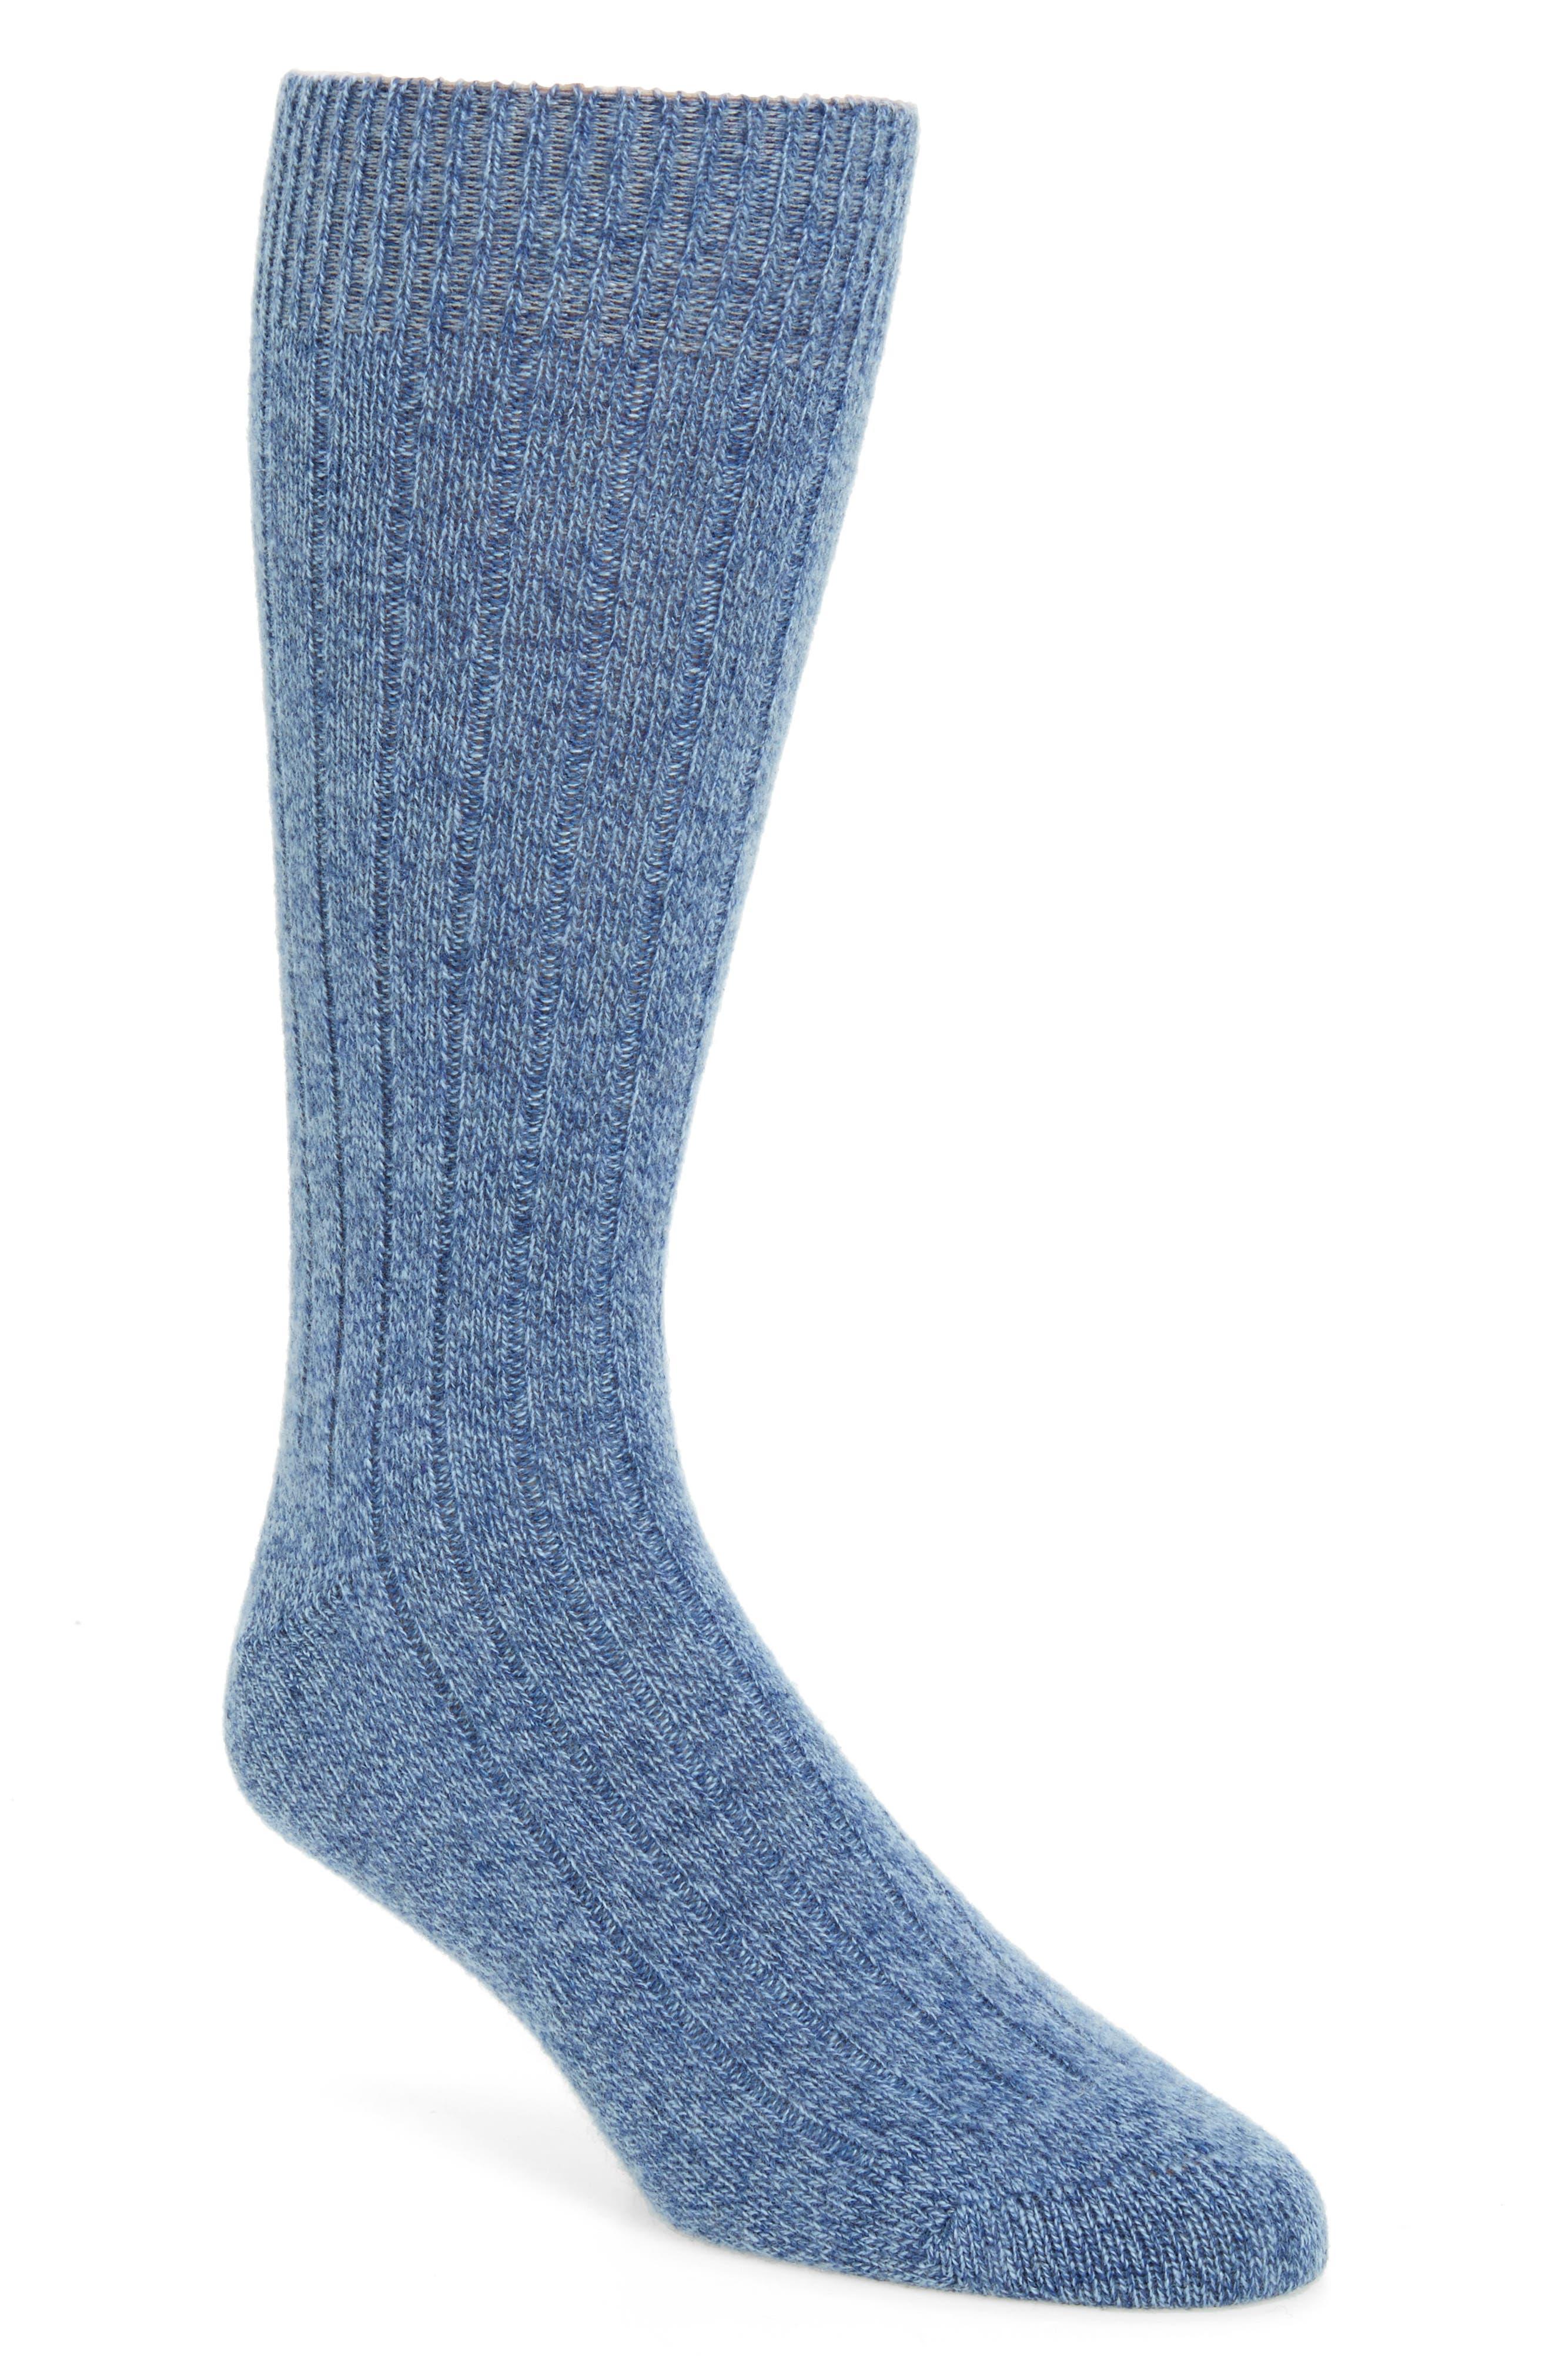 'Waddington' Cashmere Blend Mid Calf Socks,                             Alternate thumbnail 19, color,